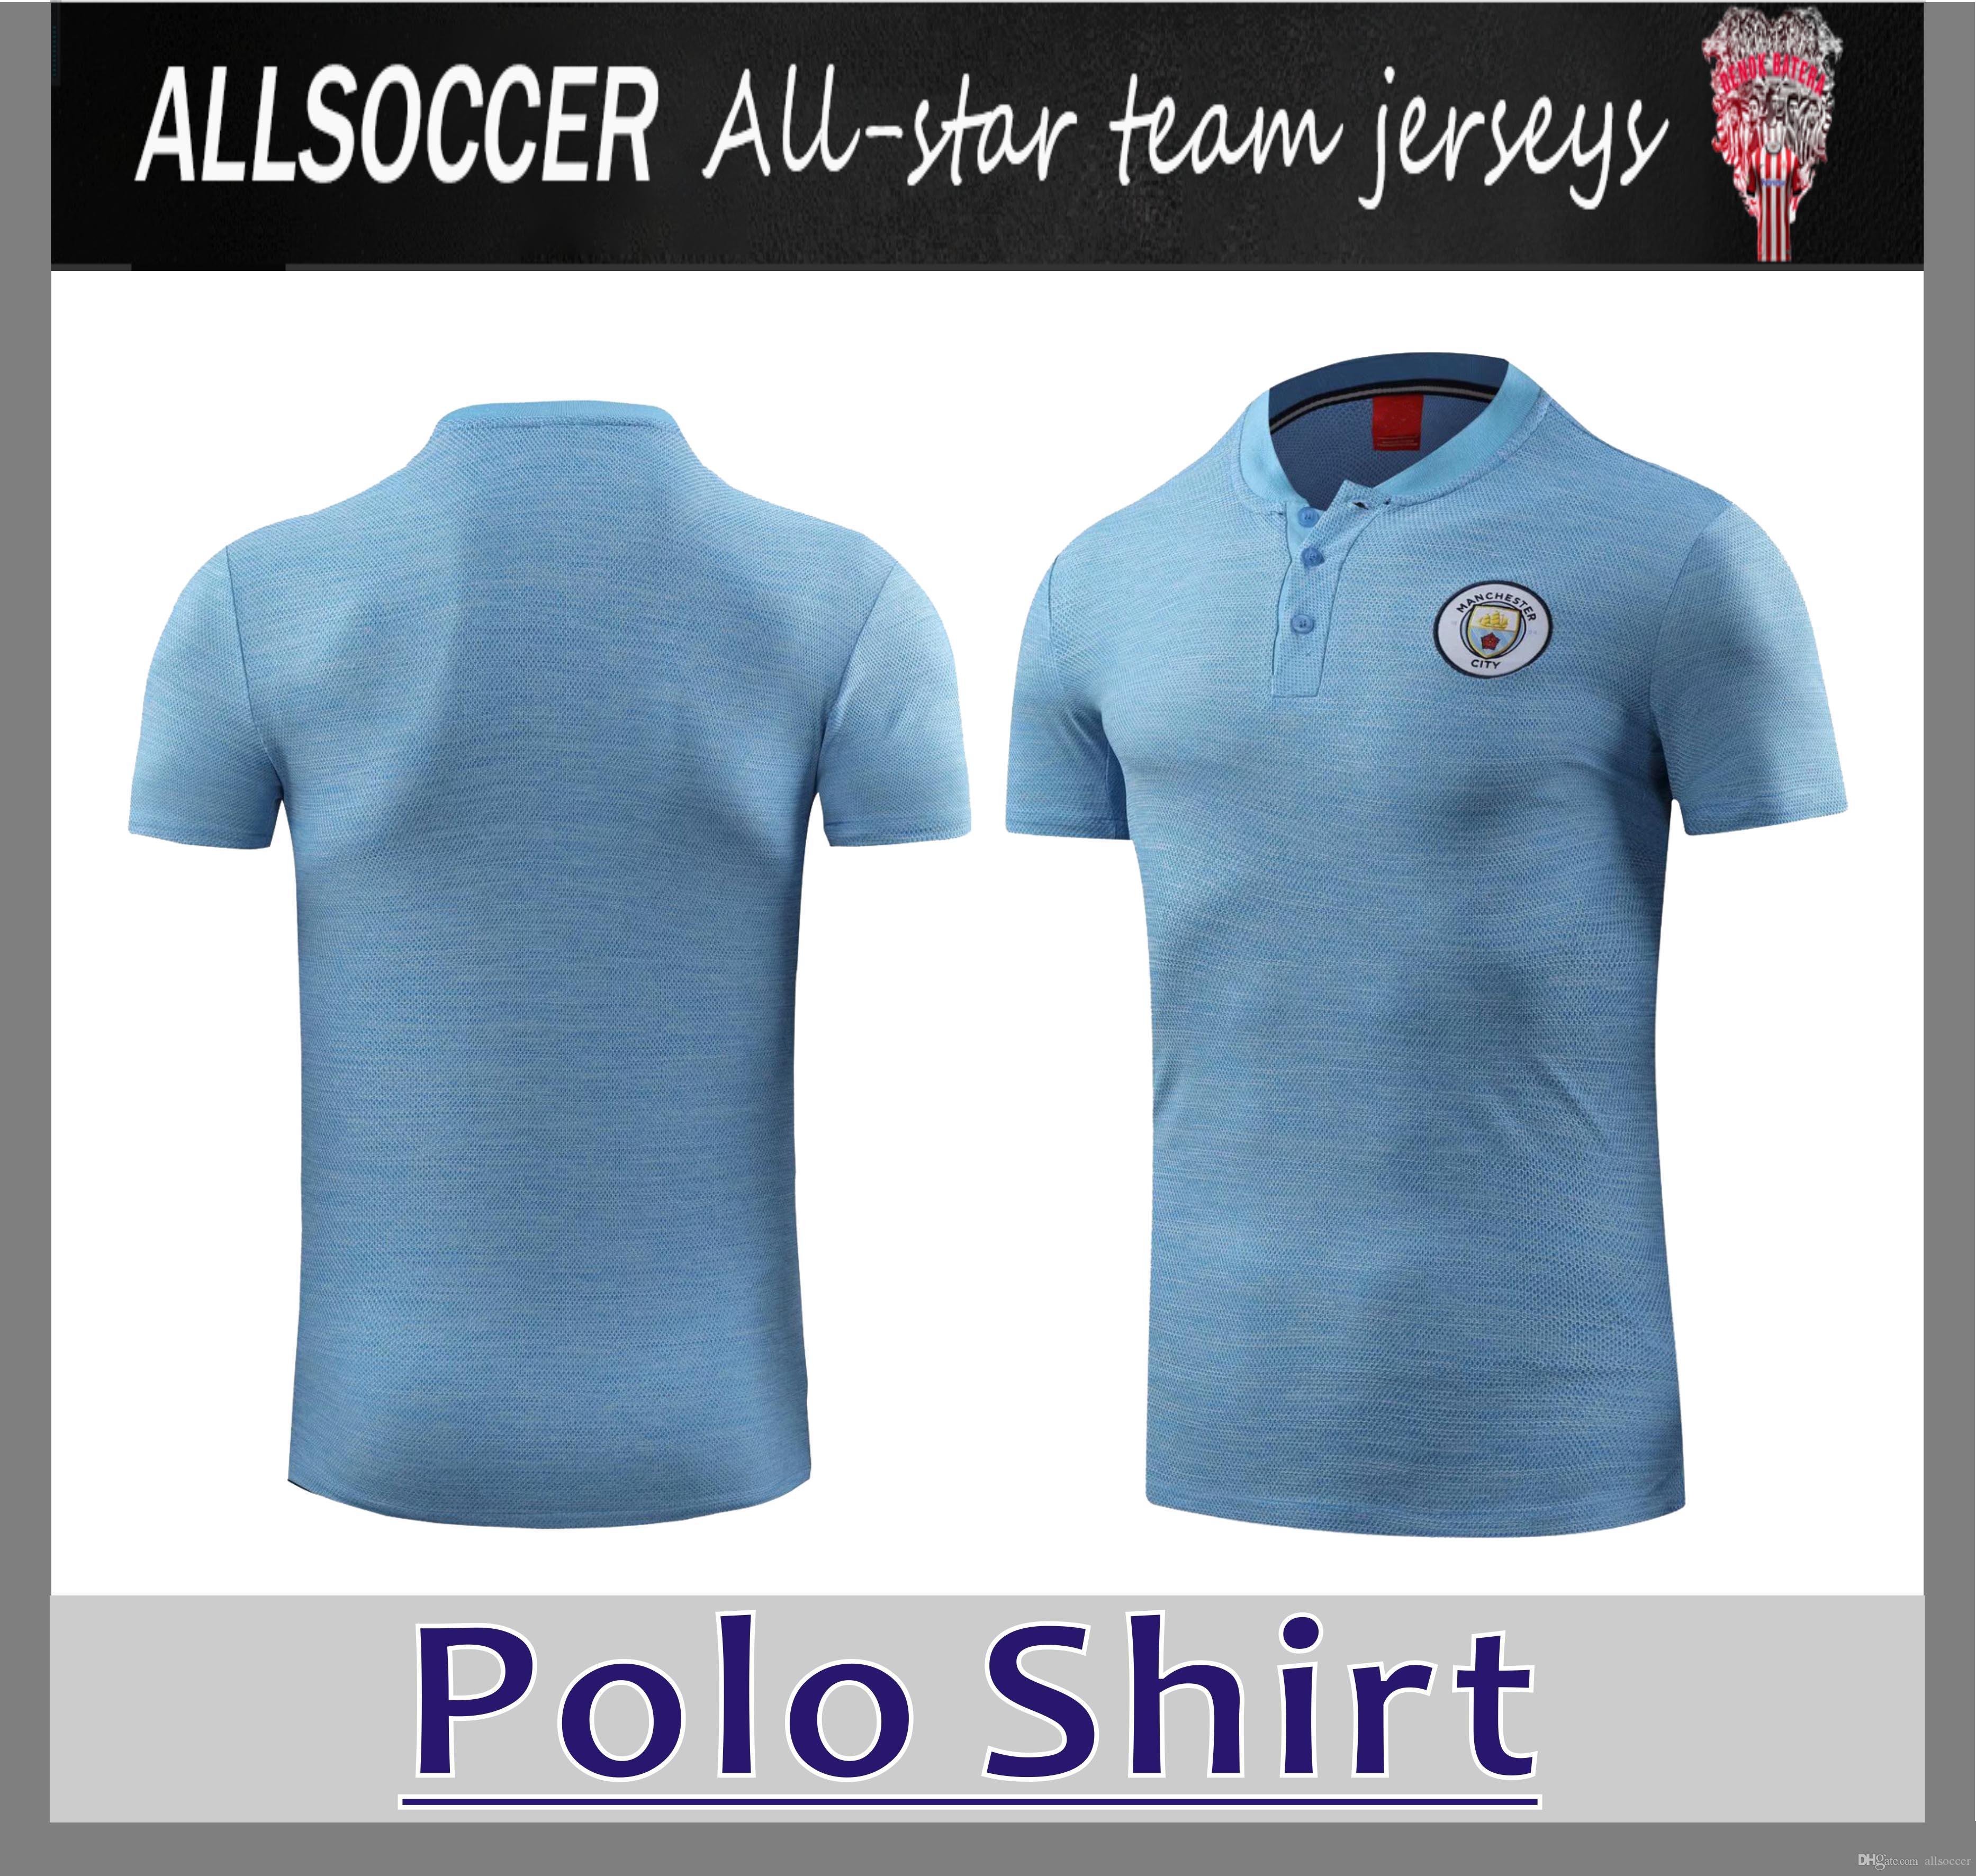 303b96530 2019 MAN CITY Polo Azul 18 19 KUNAGUERO DE BRUYNE Fútbol Polo Uniformes  Fútbol Camiseta Deportiva En VentaAtlético Por Allsoccer